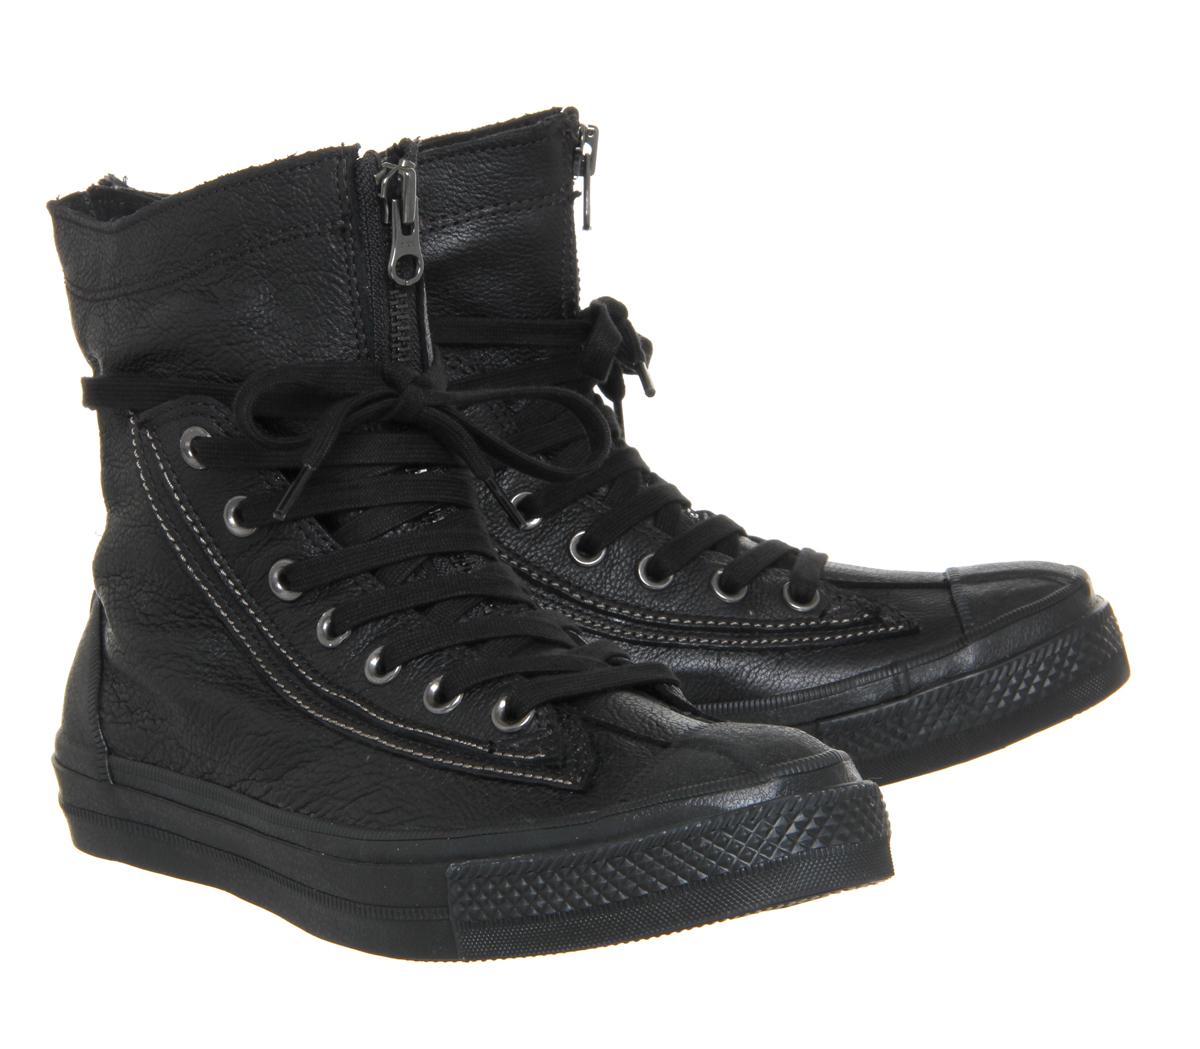 Converse Ctas Combat Boot In Black For Men Lyst